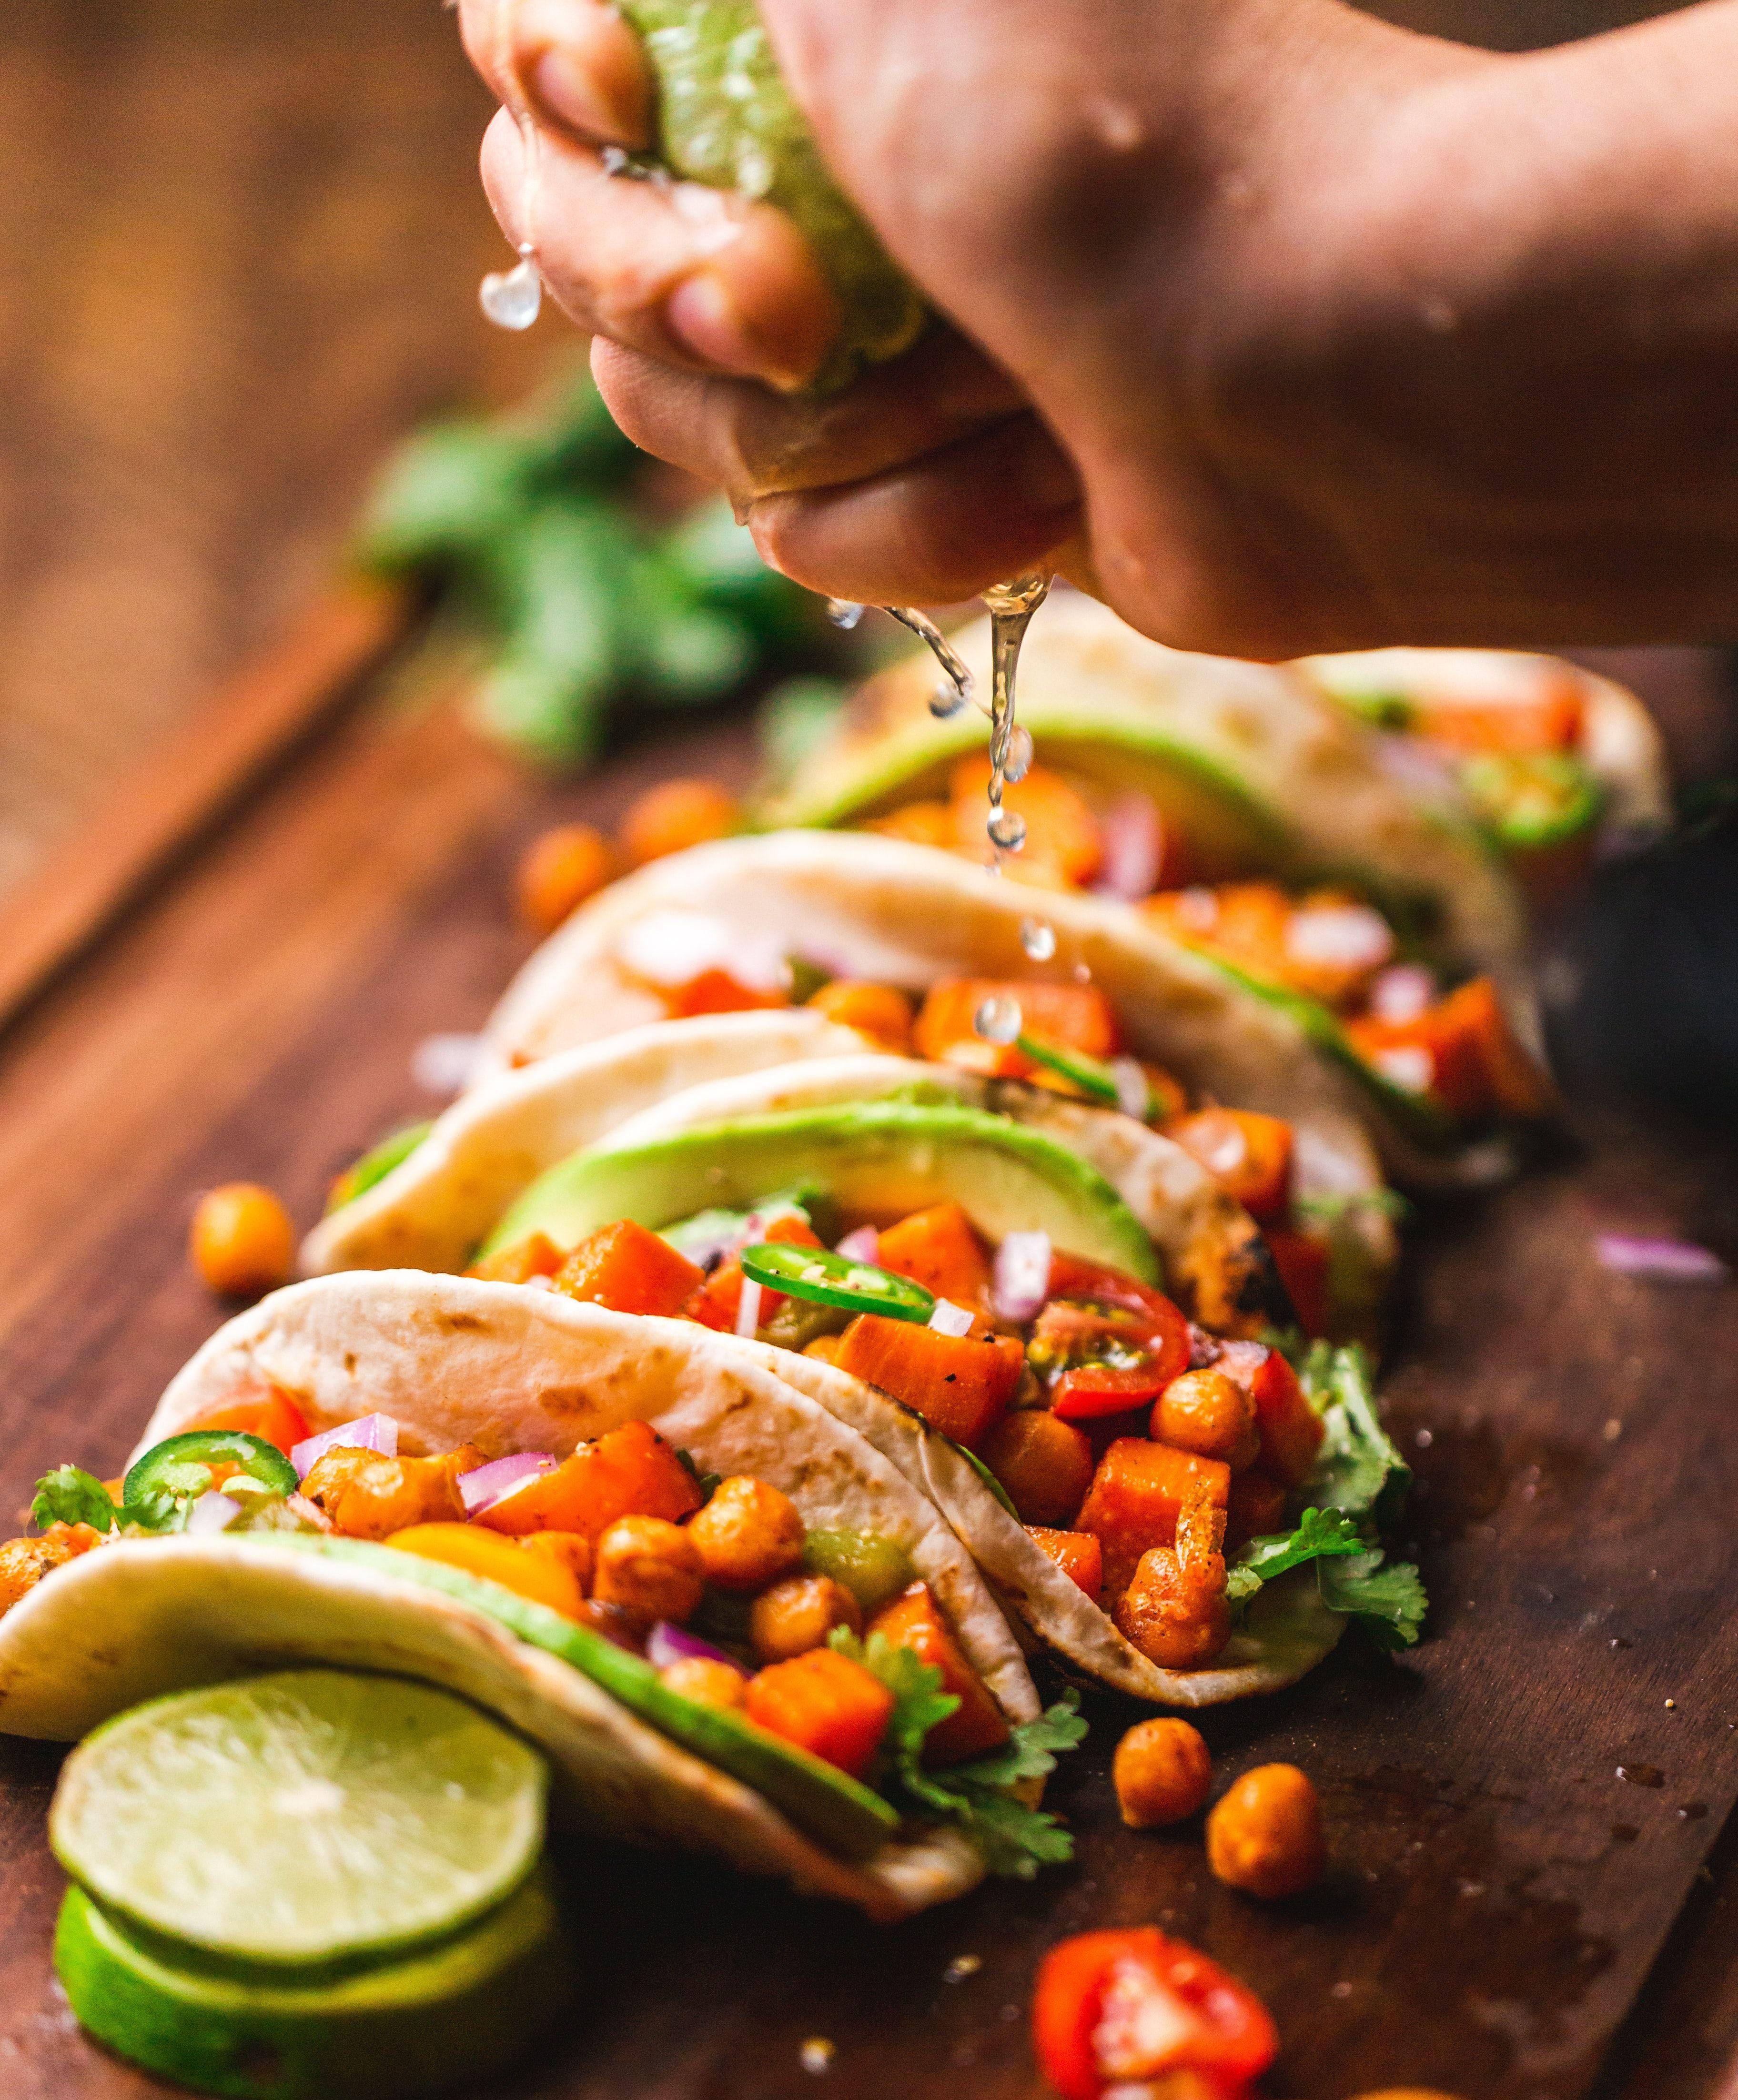 Tacos_chad-montano-lp5mcm6nz5a-unsplash